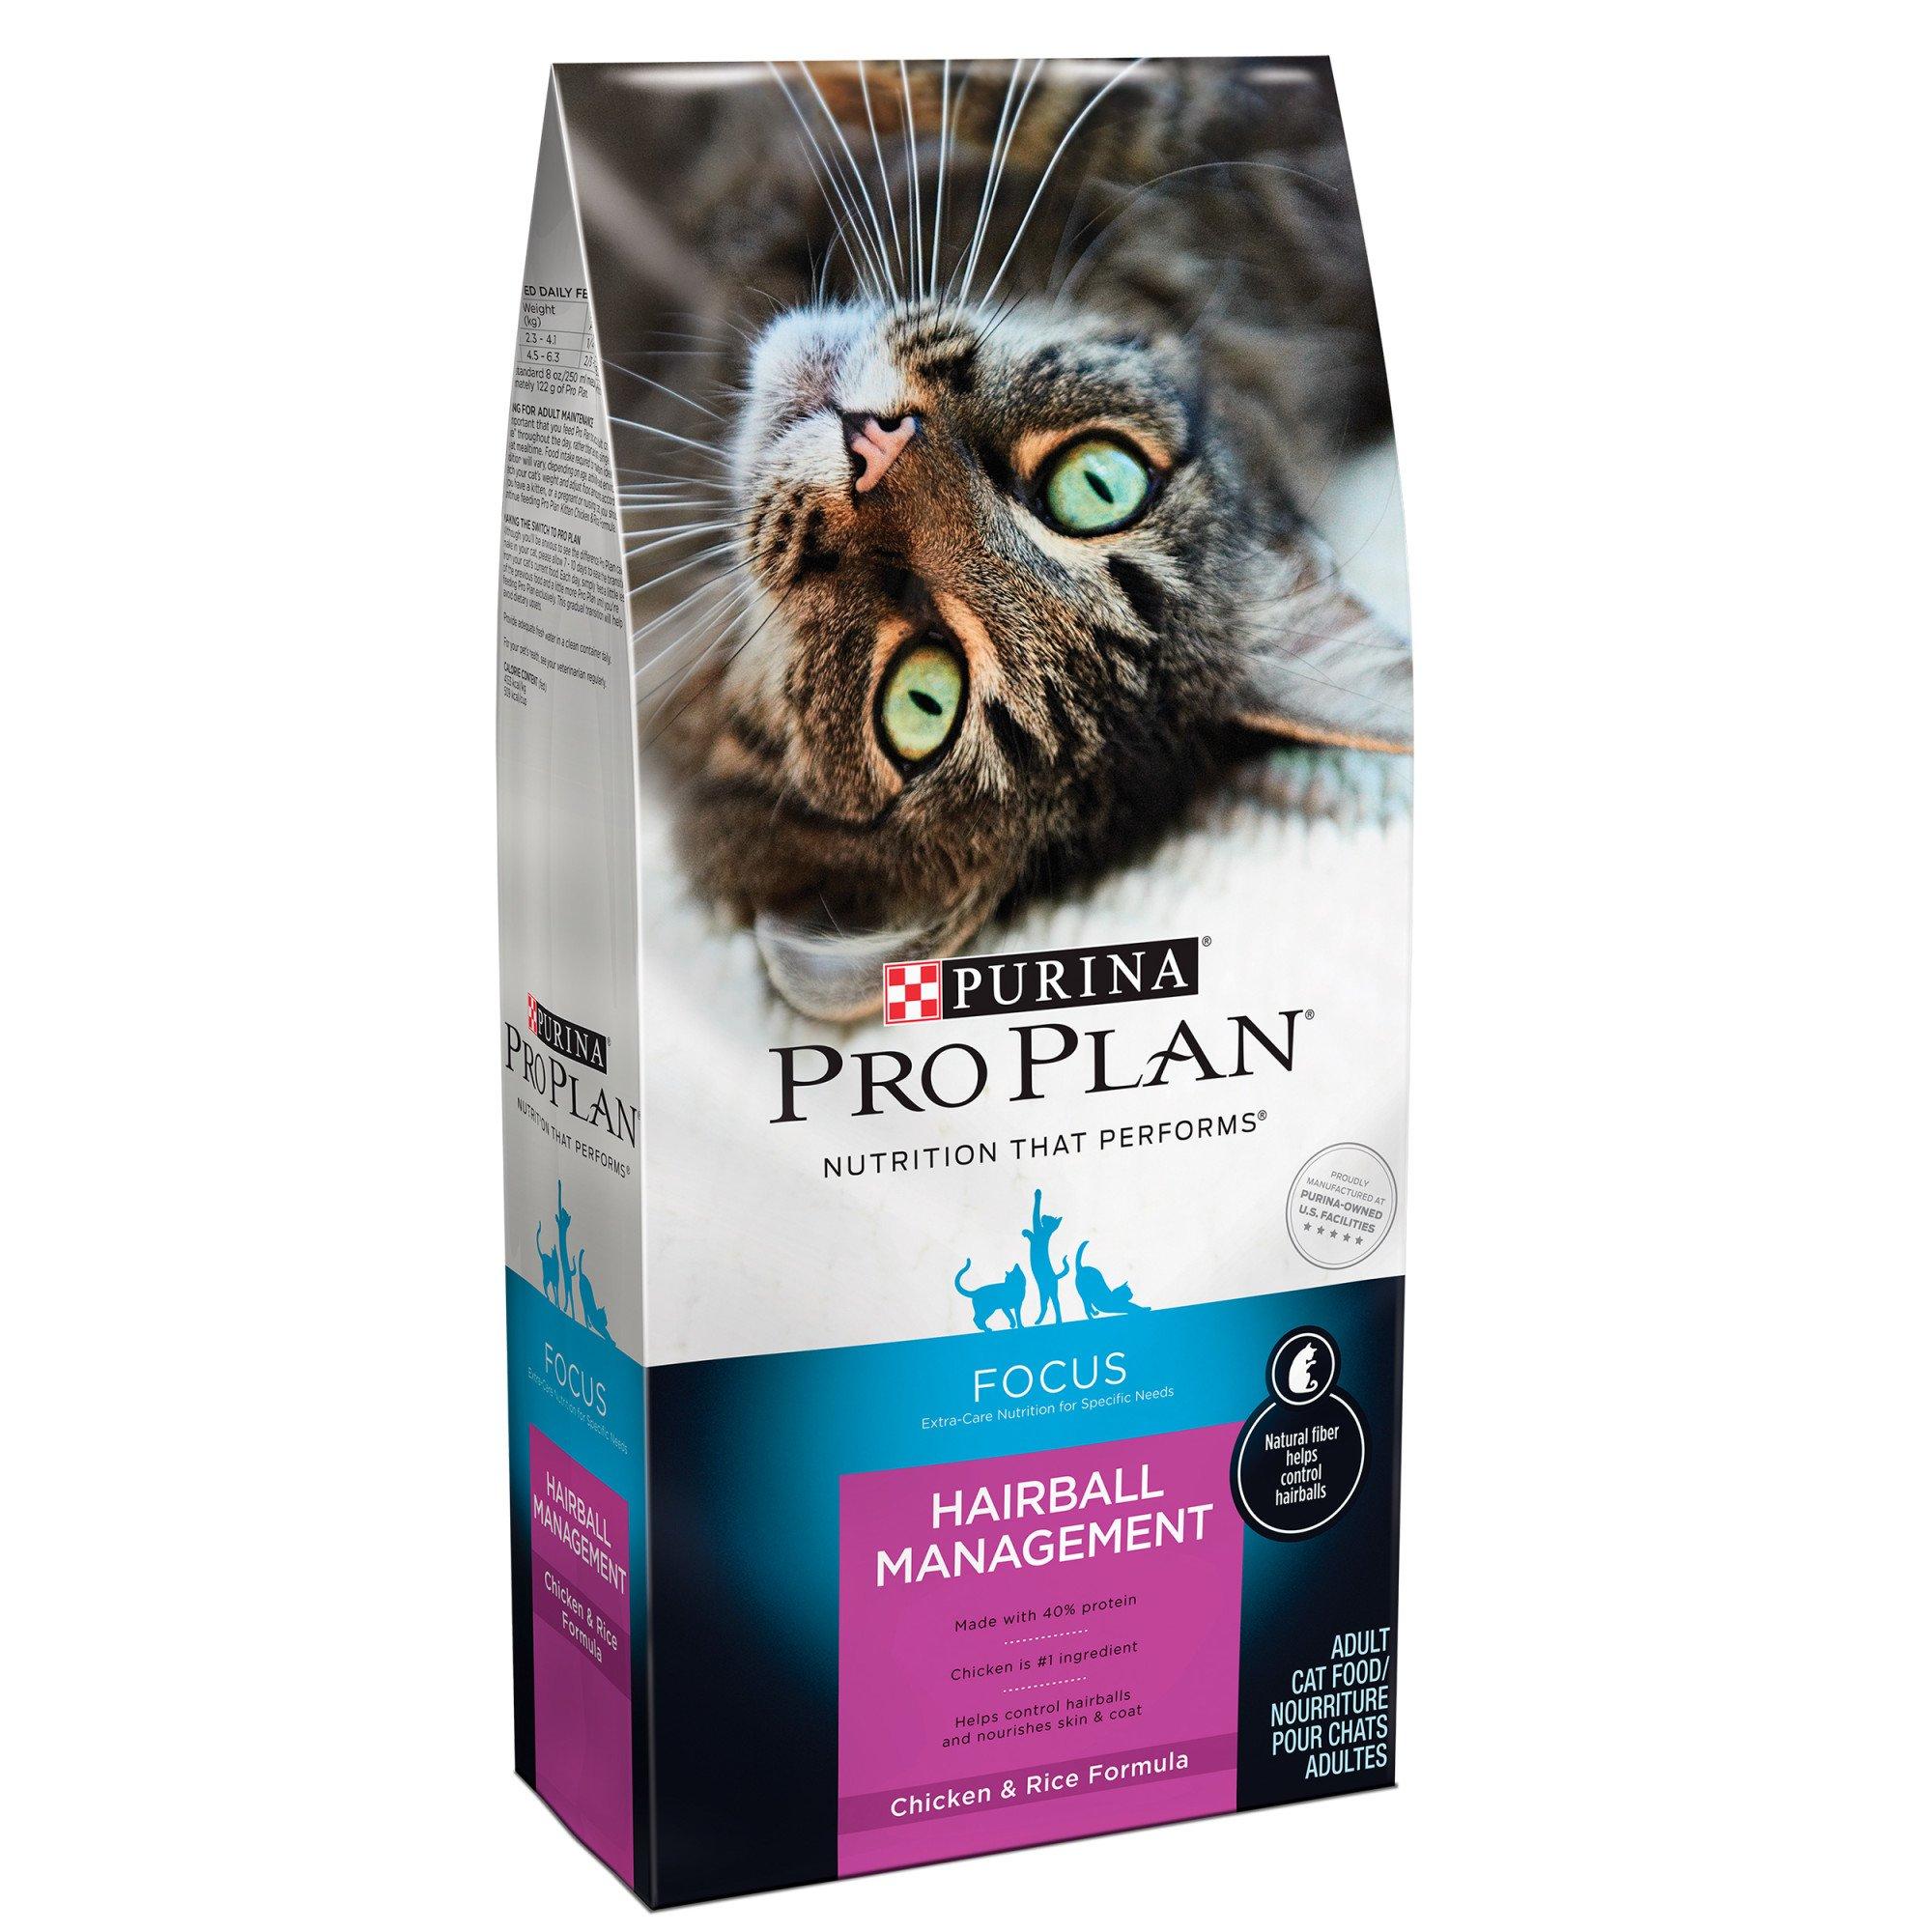 Pro Plan Cat Food Petco